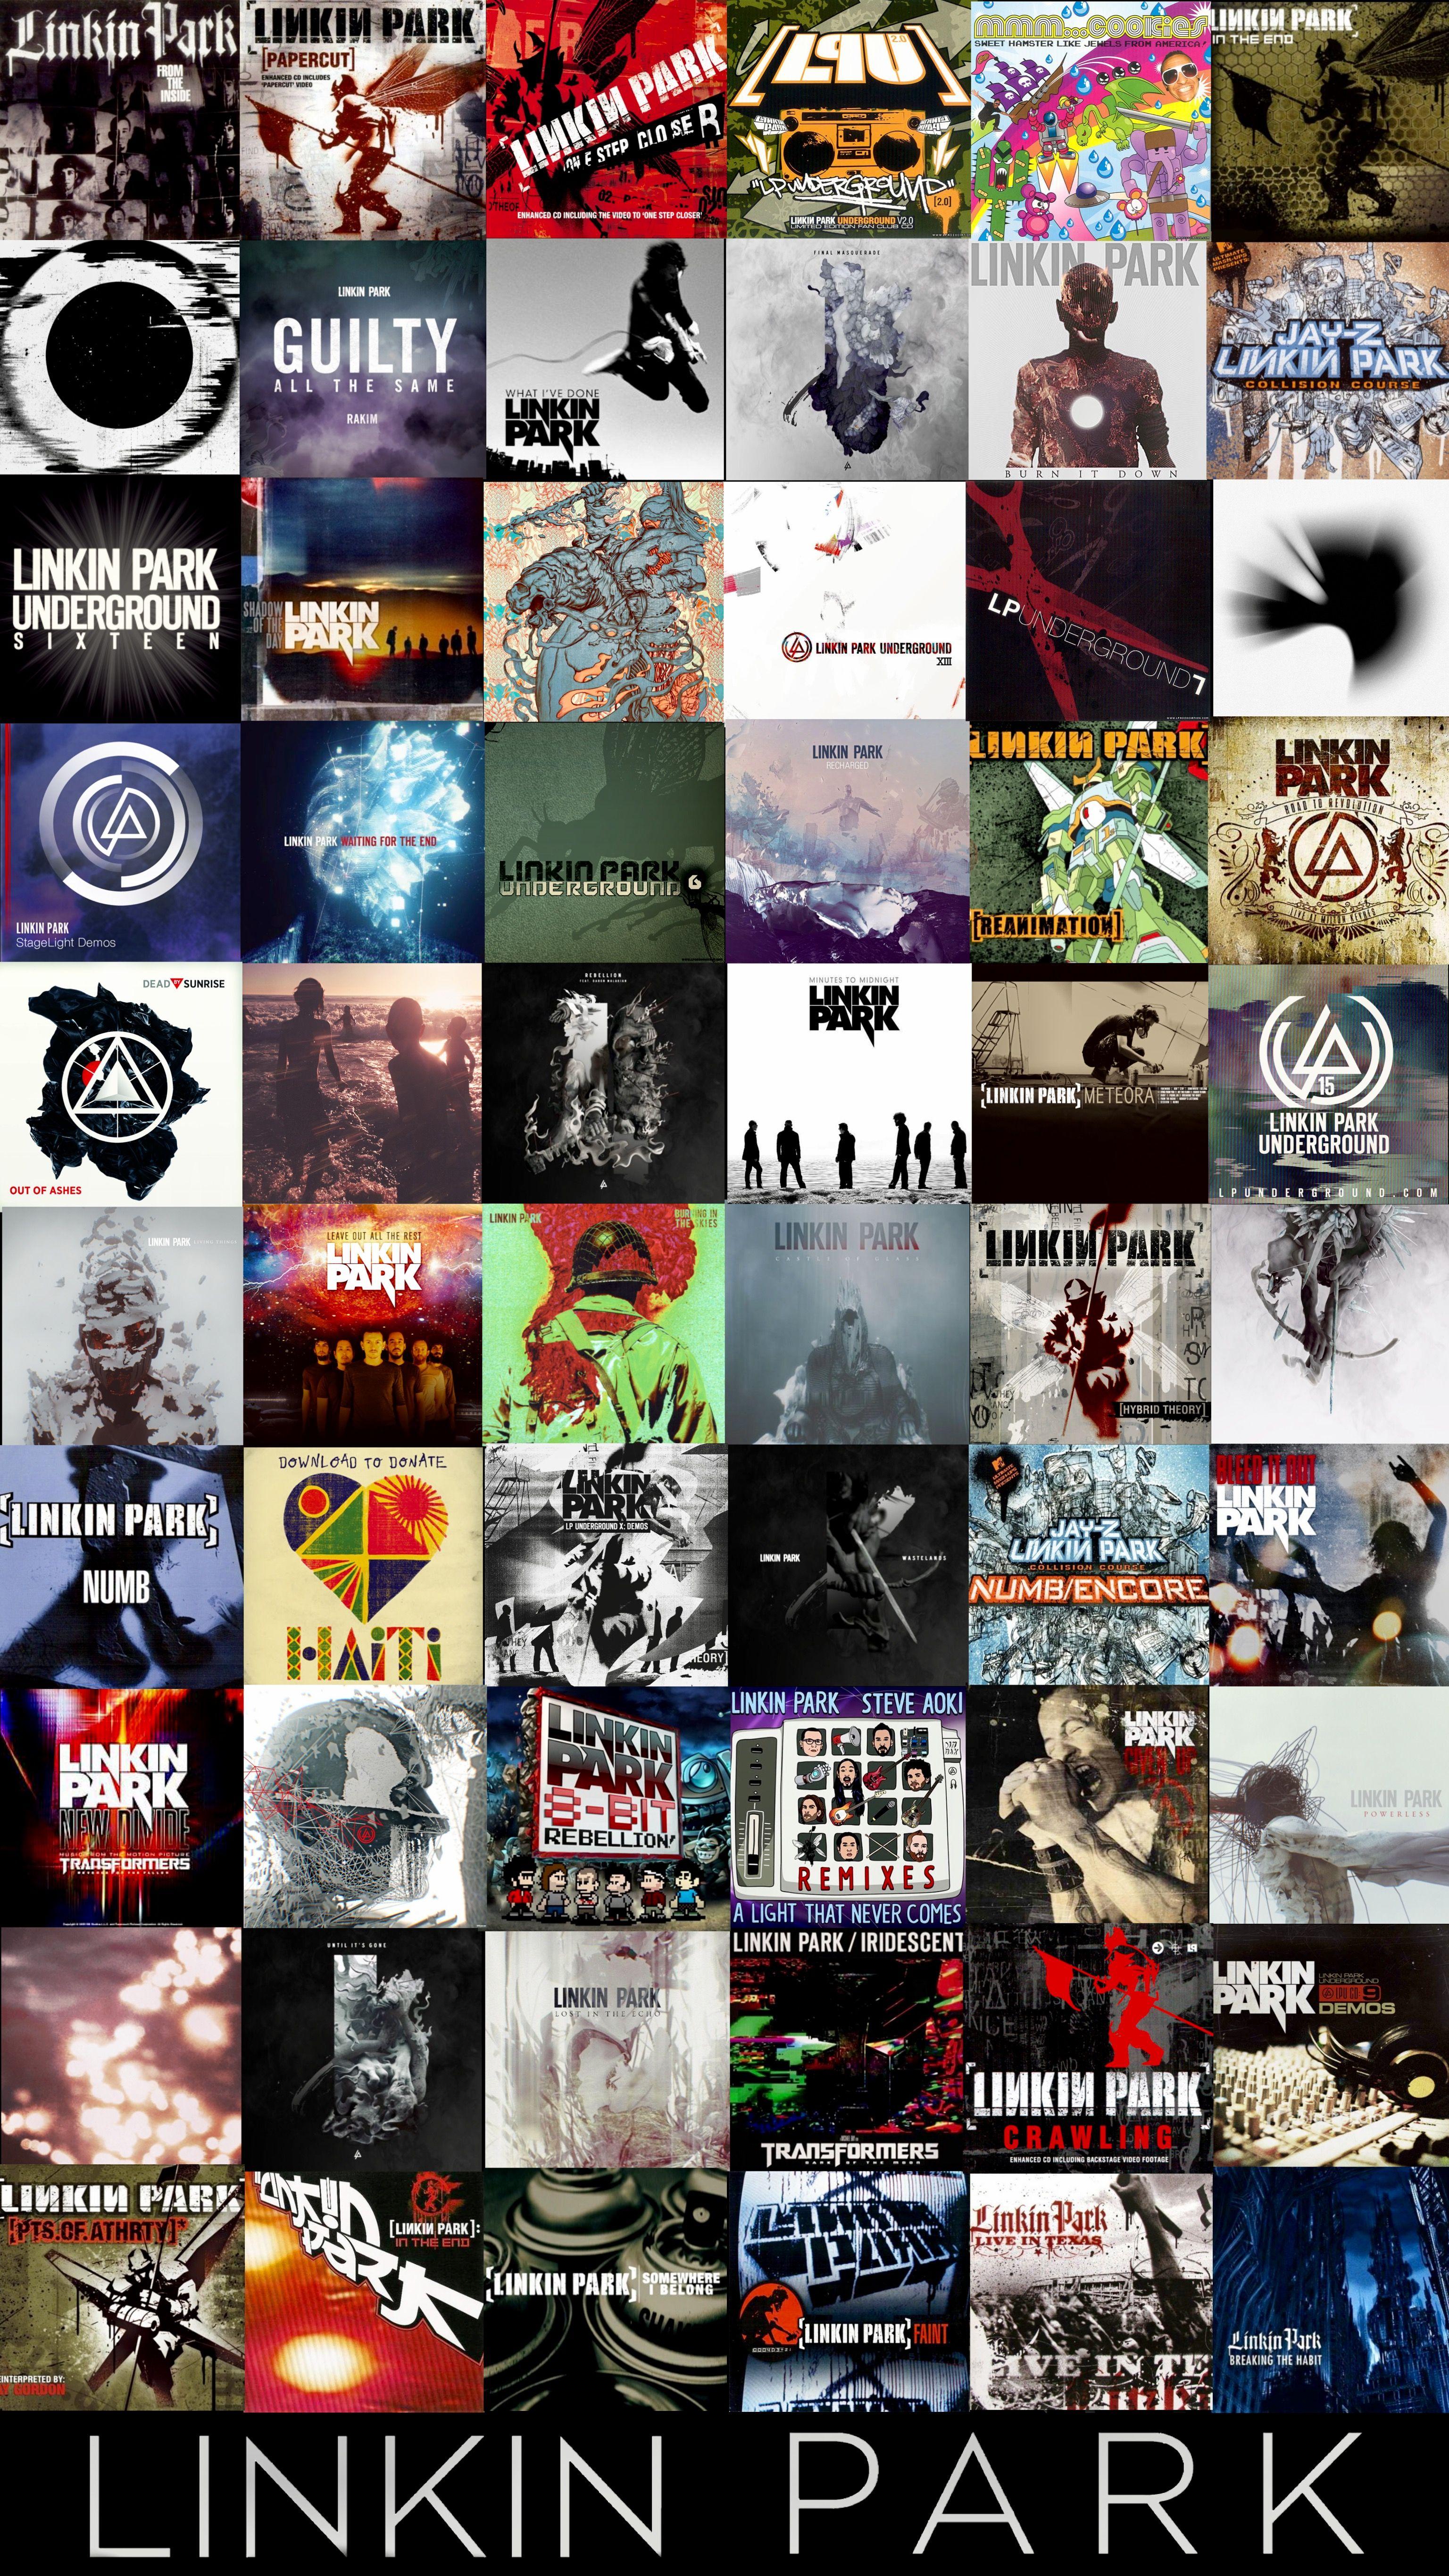 Linkin Park Album Art Linkin Park Linkin Park Chester